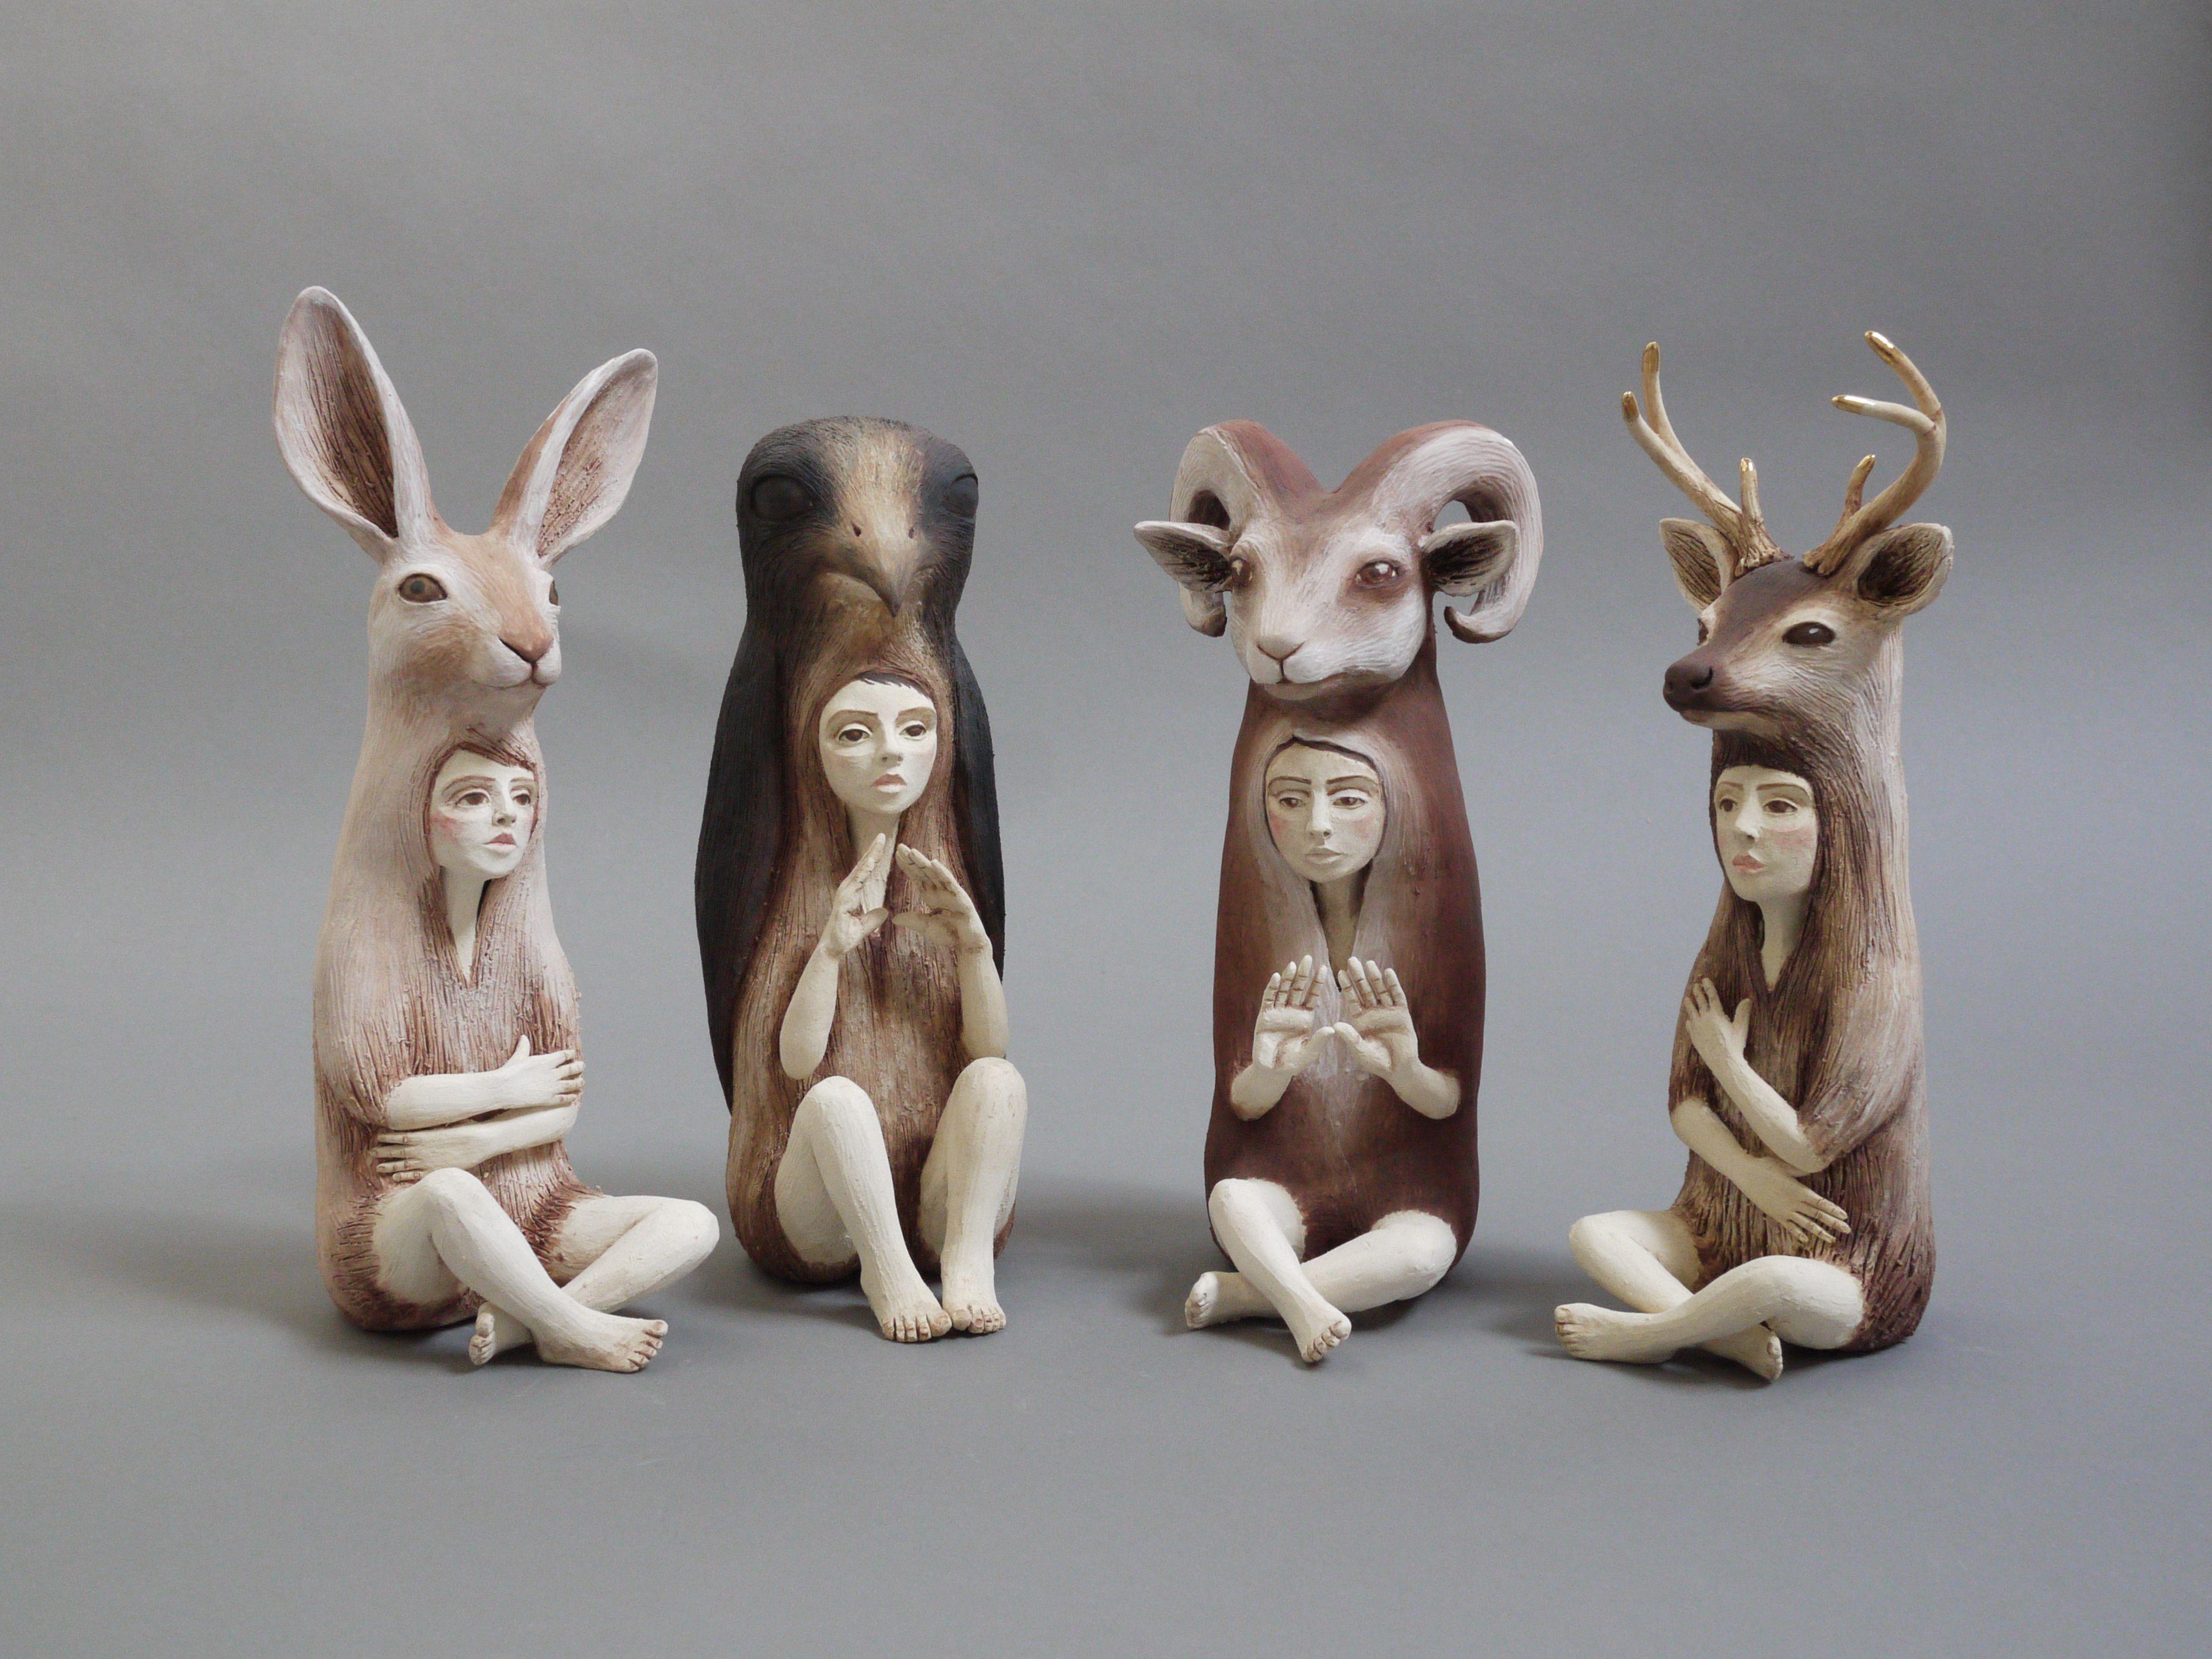 Crystal Morey Predator And Prey Bedford Gallery Walnut Creek Ca 2013 Art Sculpture Sculptures